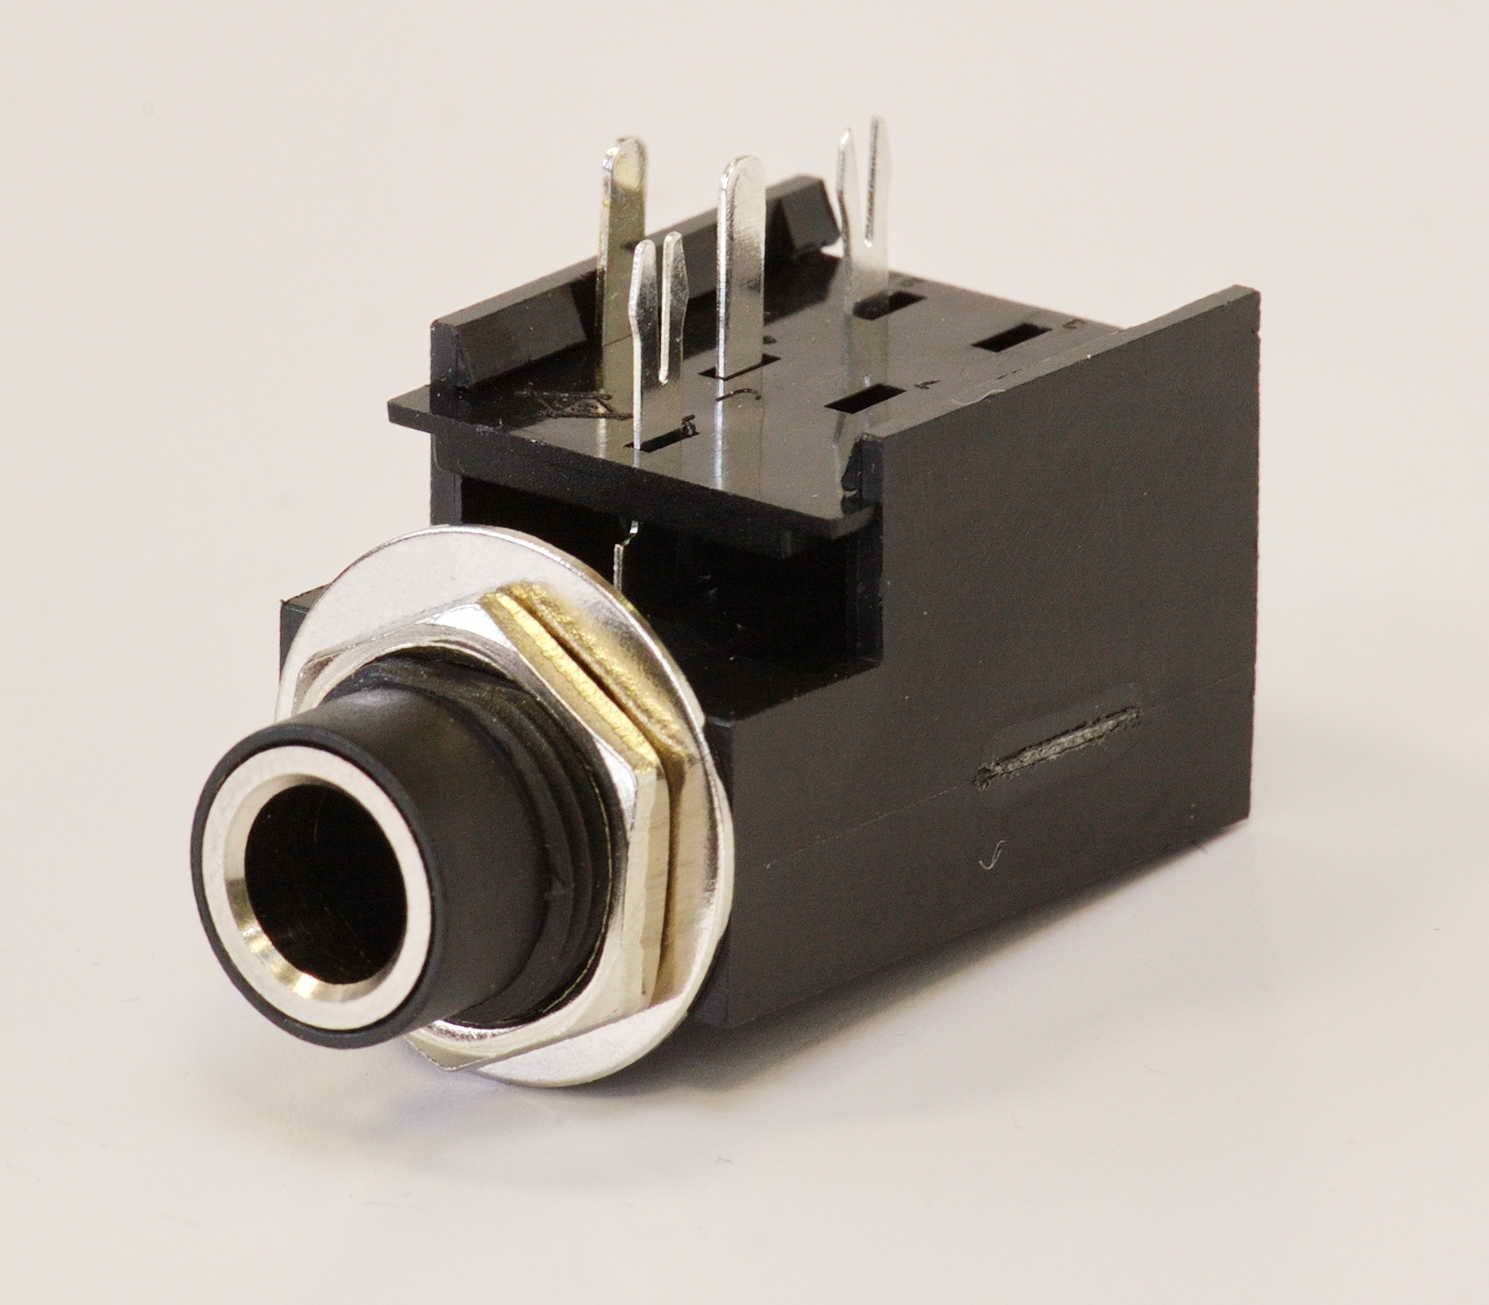 FENDER® MONO AMPLIFIER GUITAR AMP JACK SOCKET 4-PIN *NEW* 099-0912-000